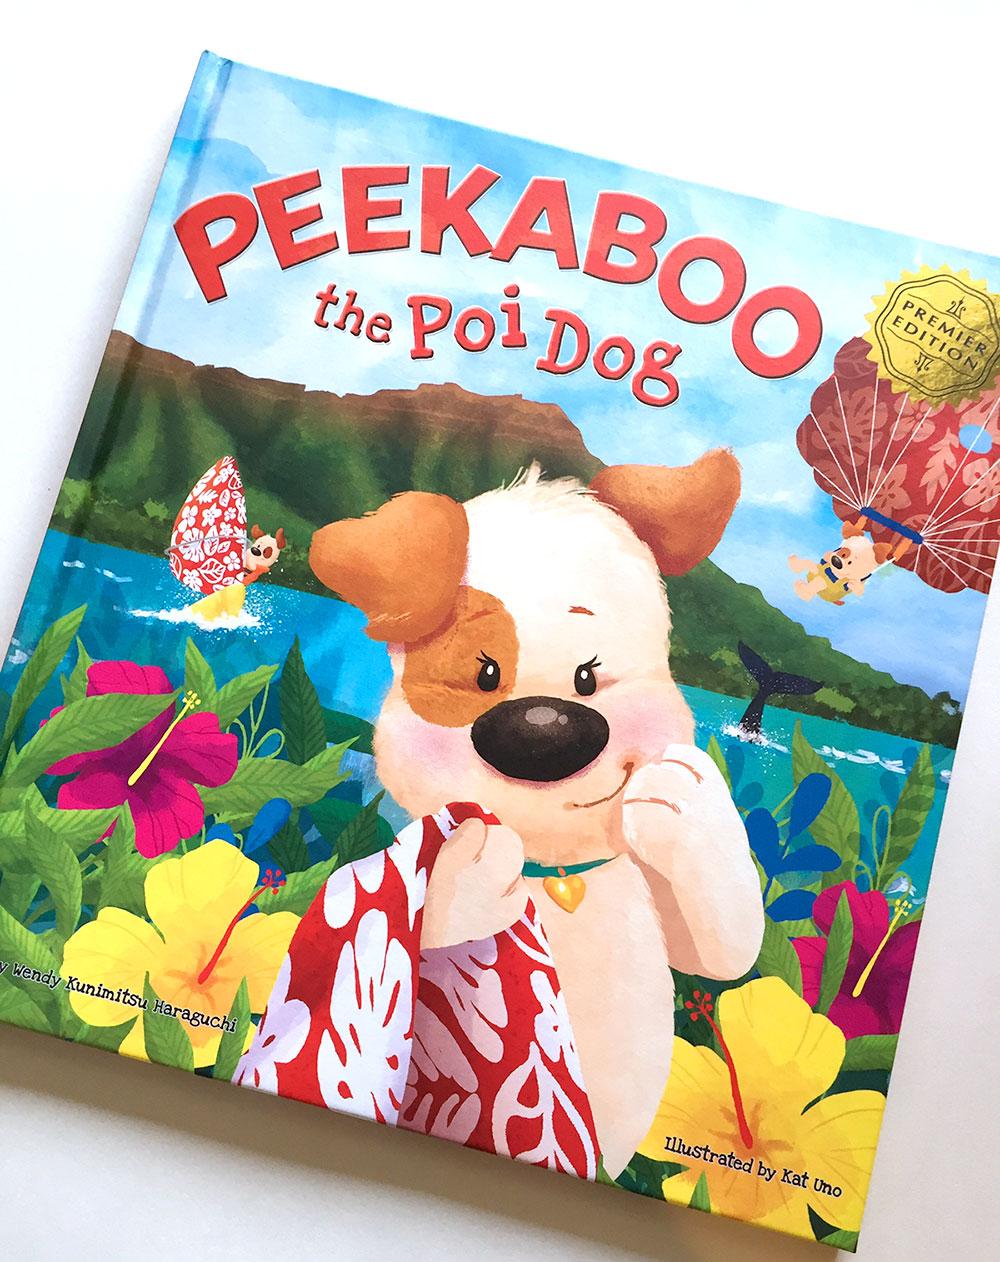 Peekaboo the Poi Dog